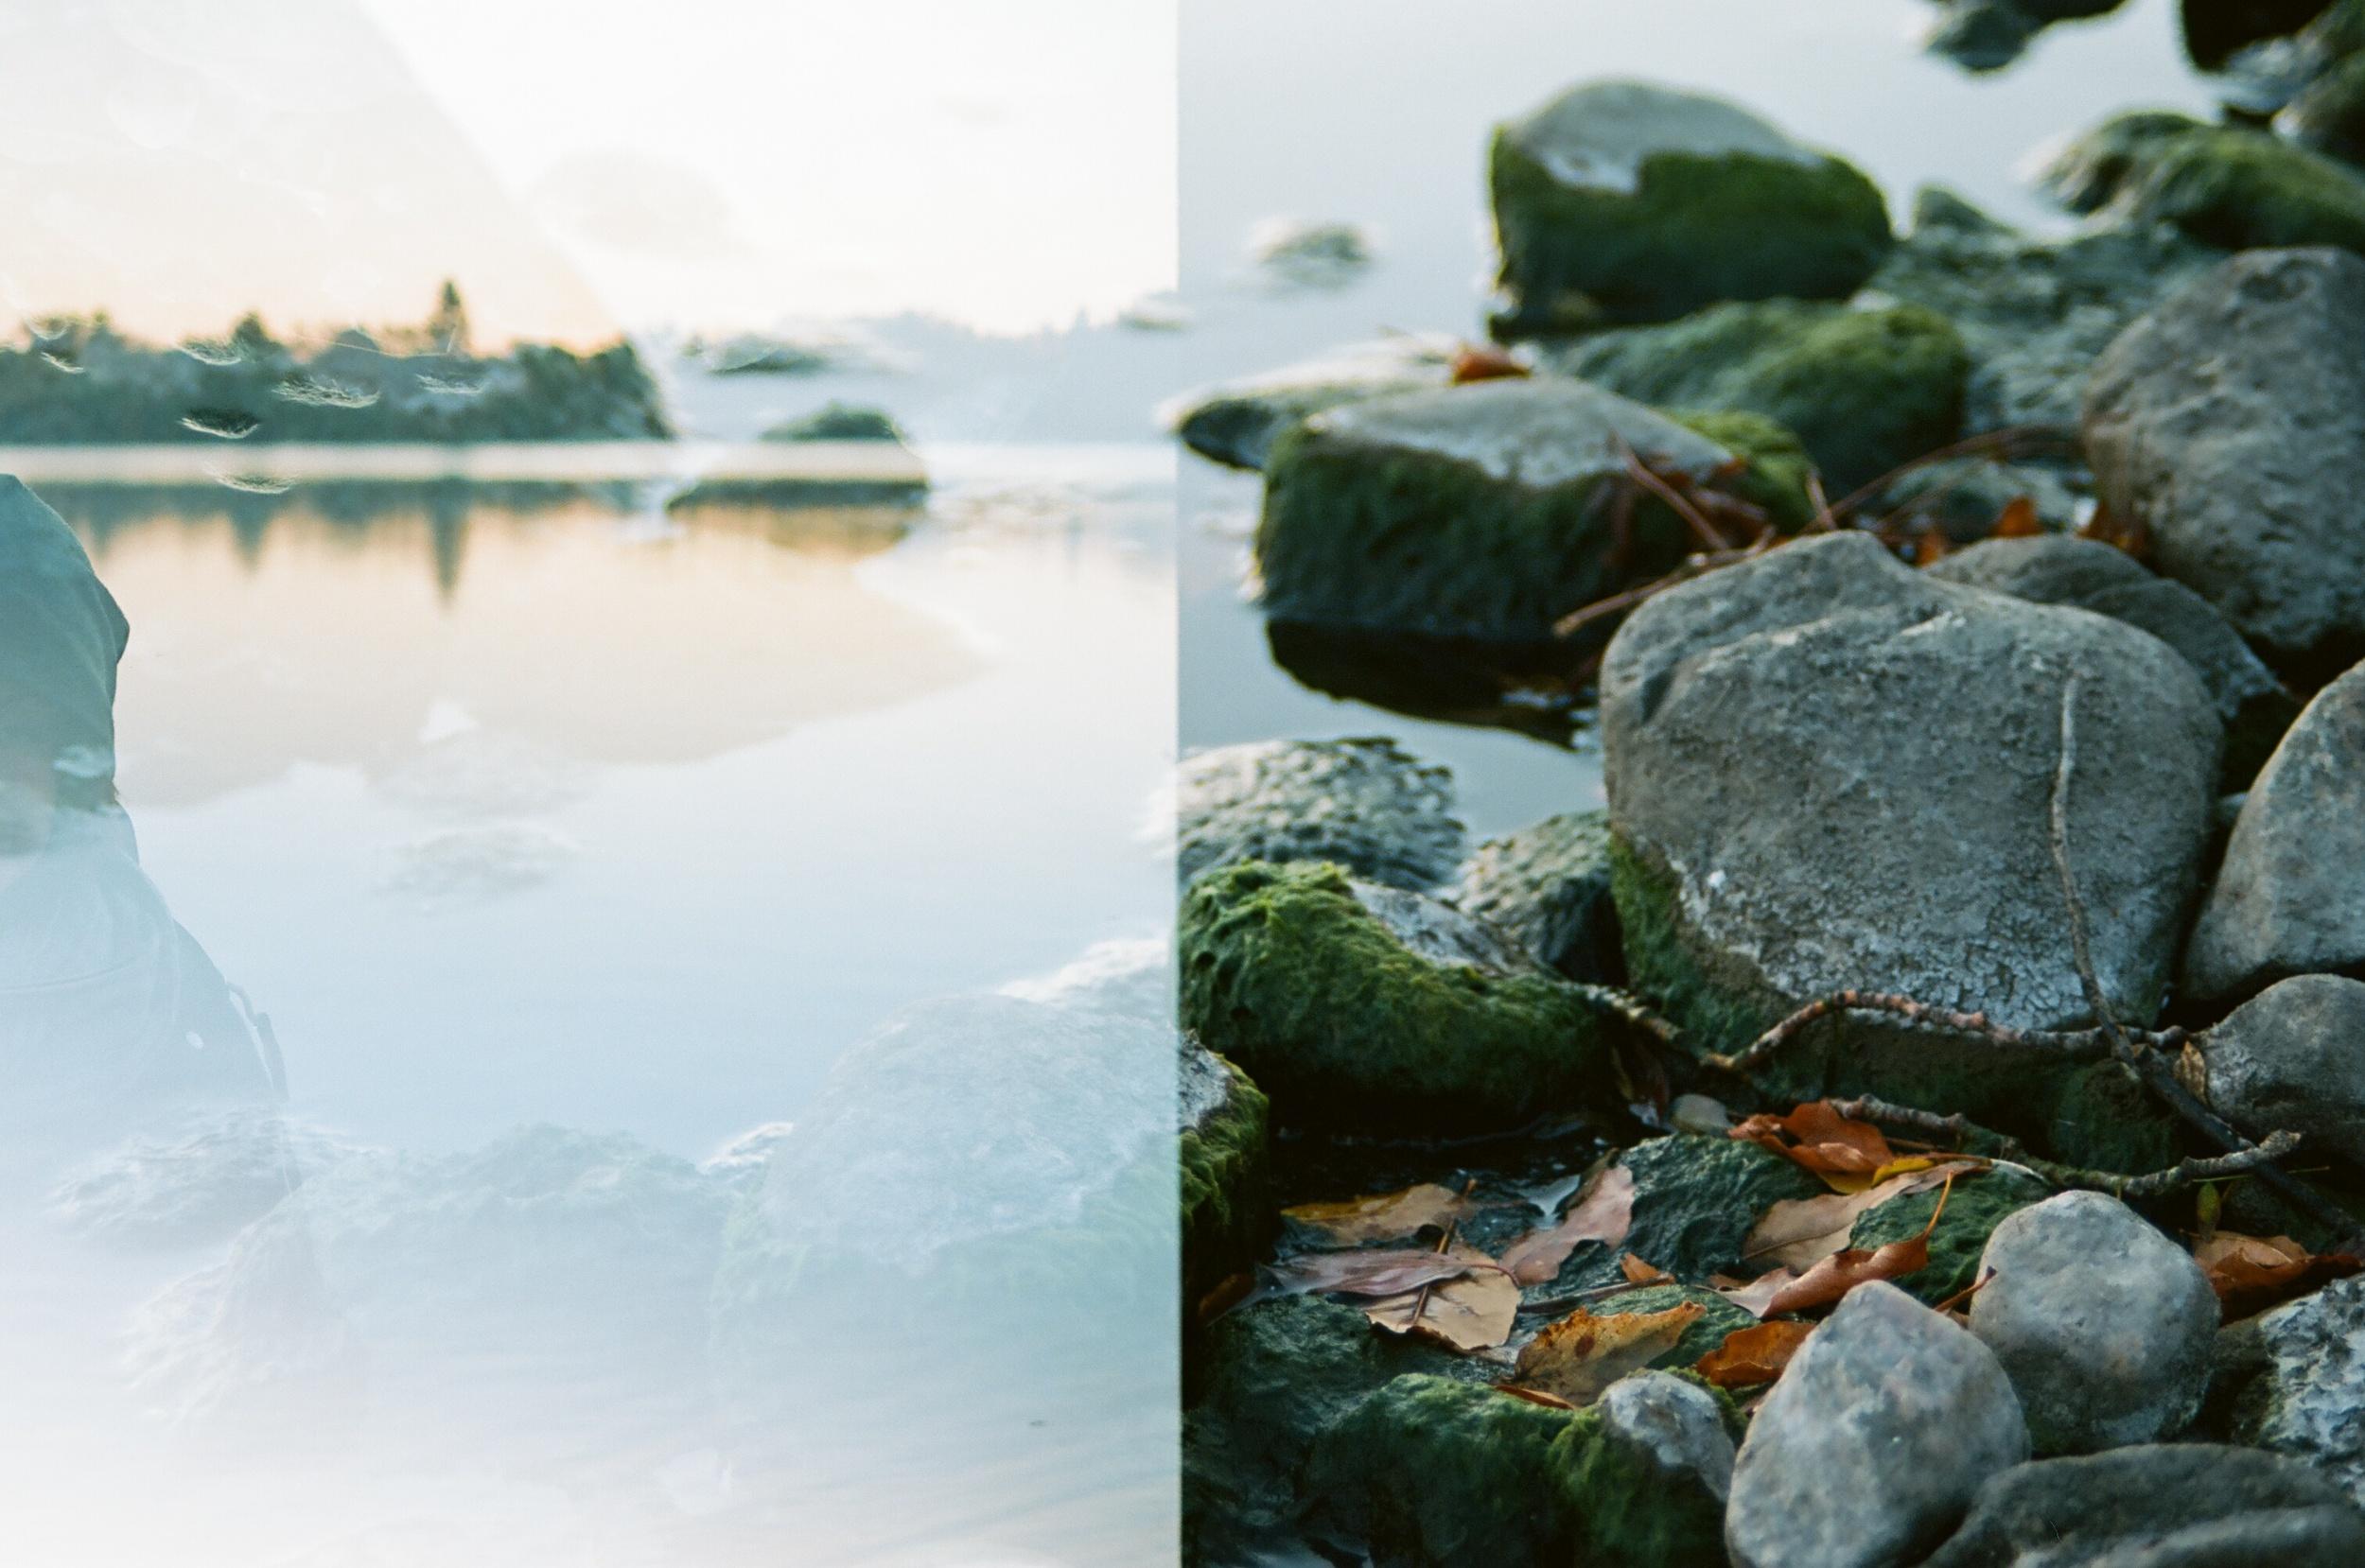 A double-exposure that didn't work as planned. | Pentax K1000 | Kodak Ektar 100